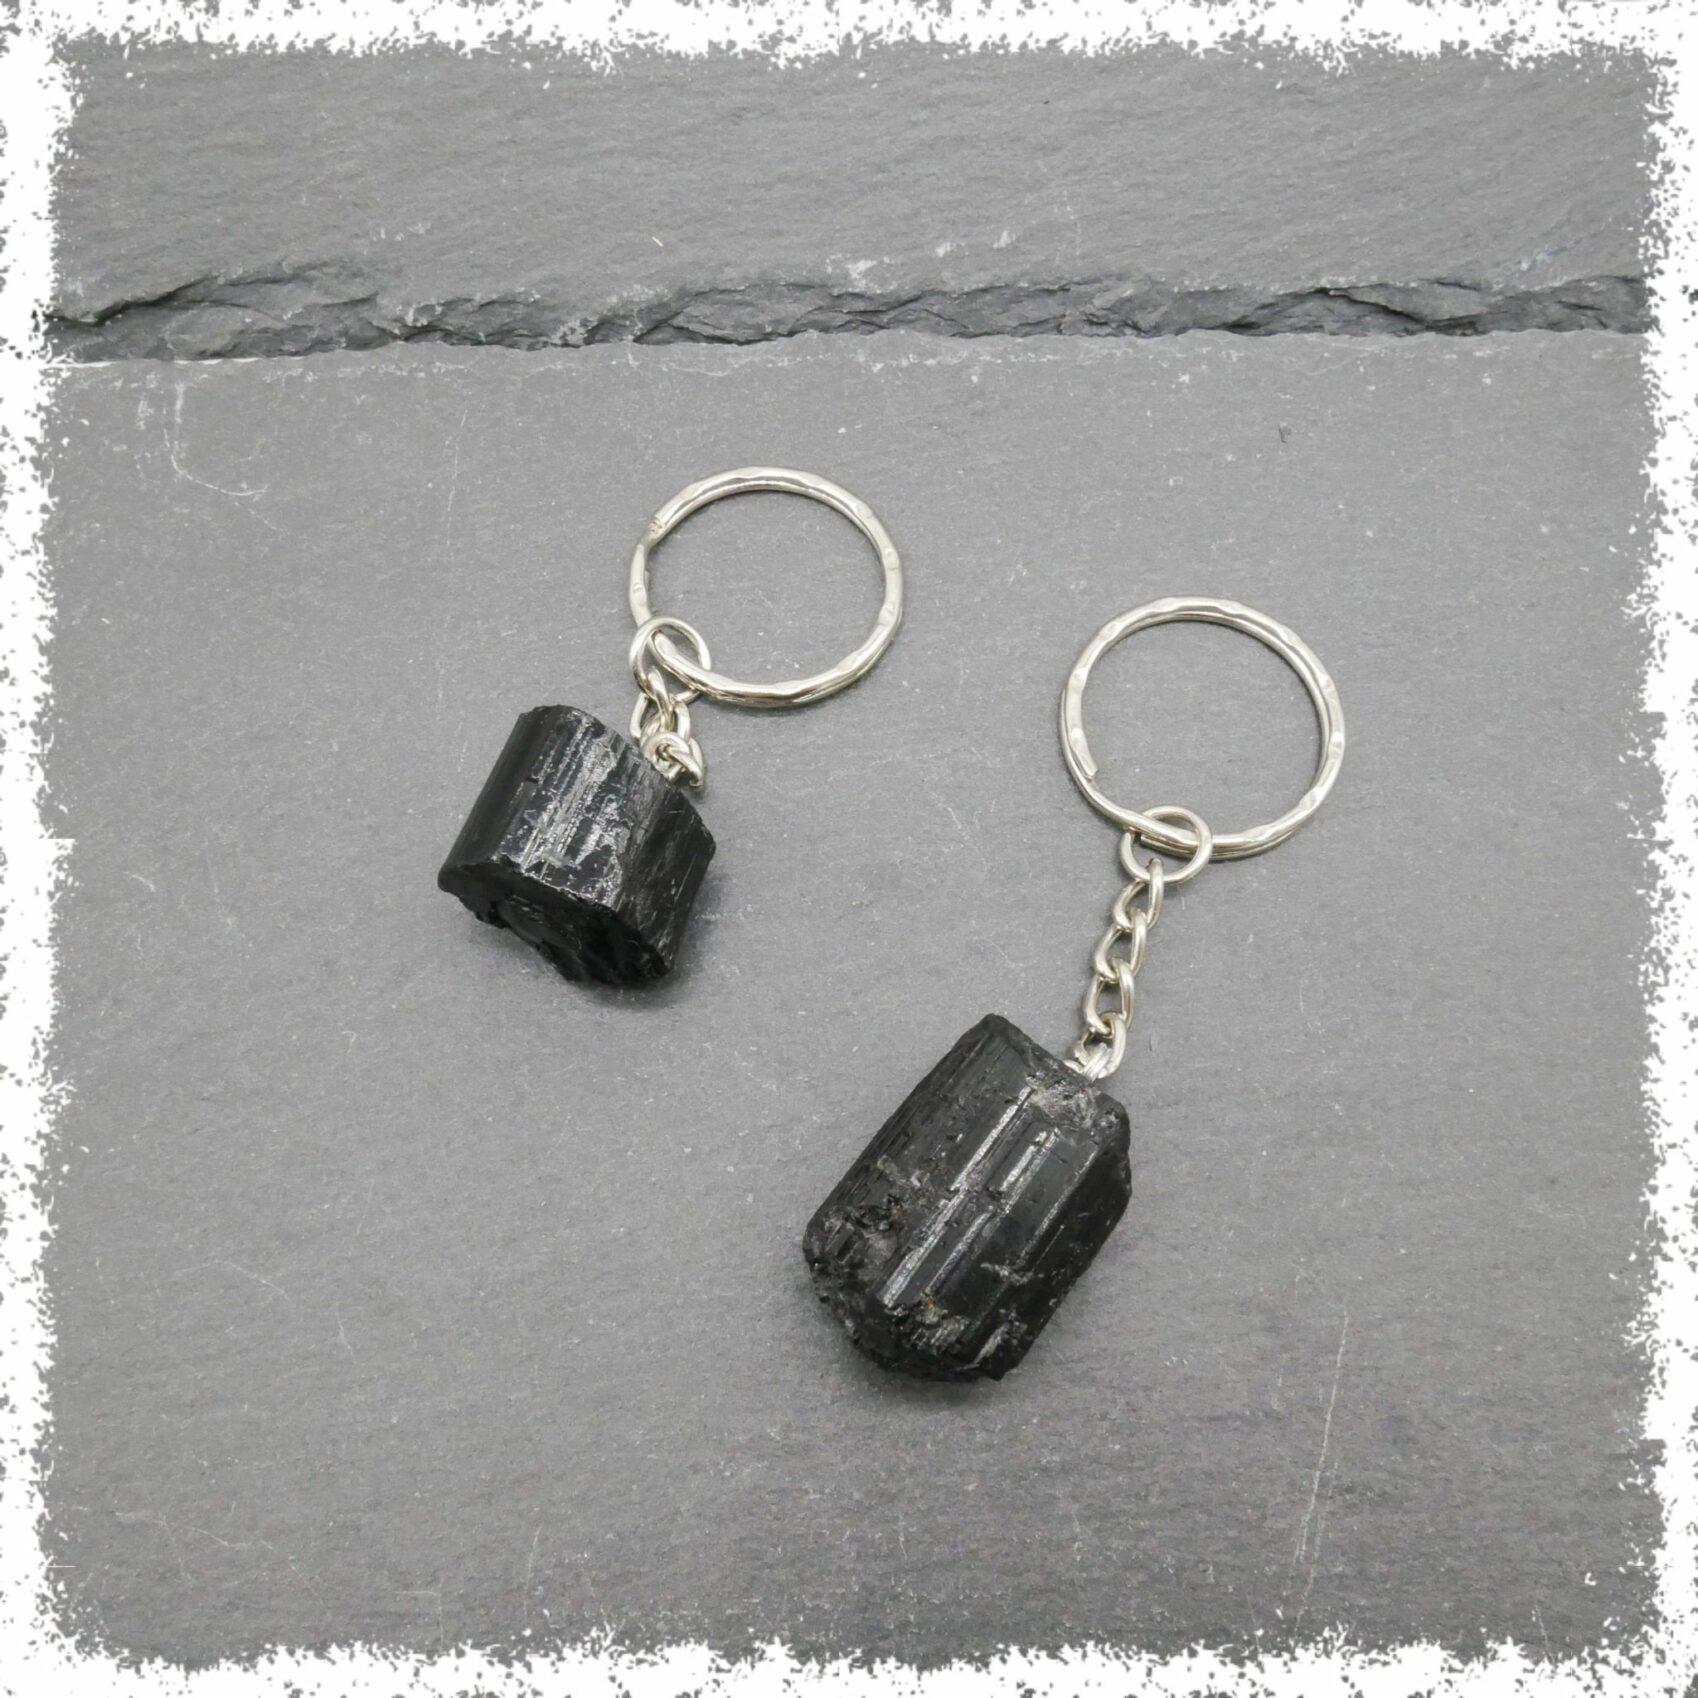 Black Tourmaline Crystal Key Chain